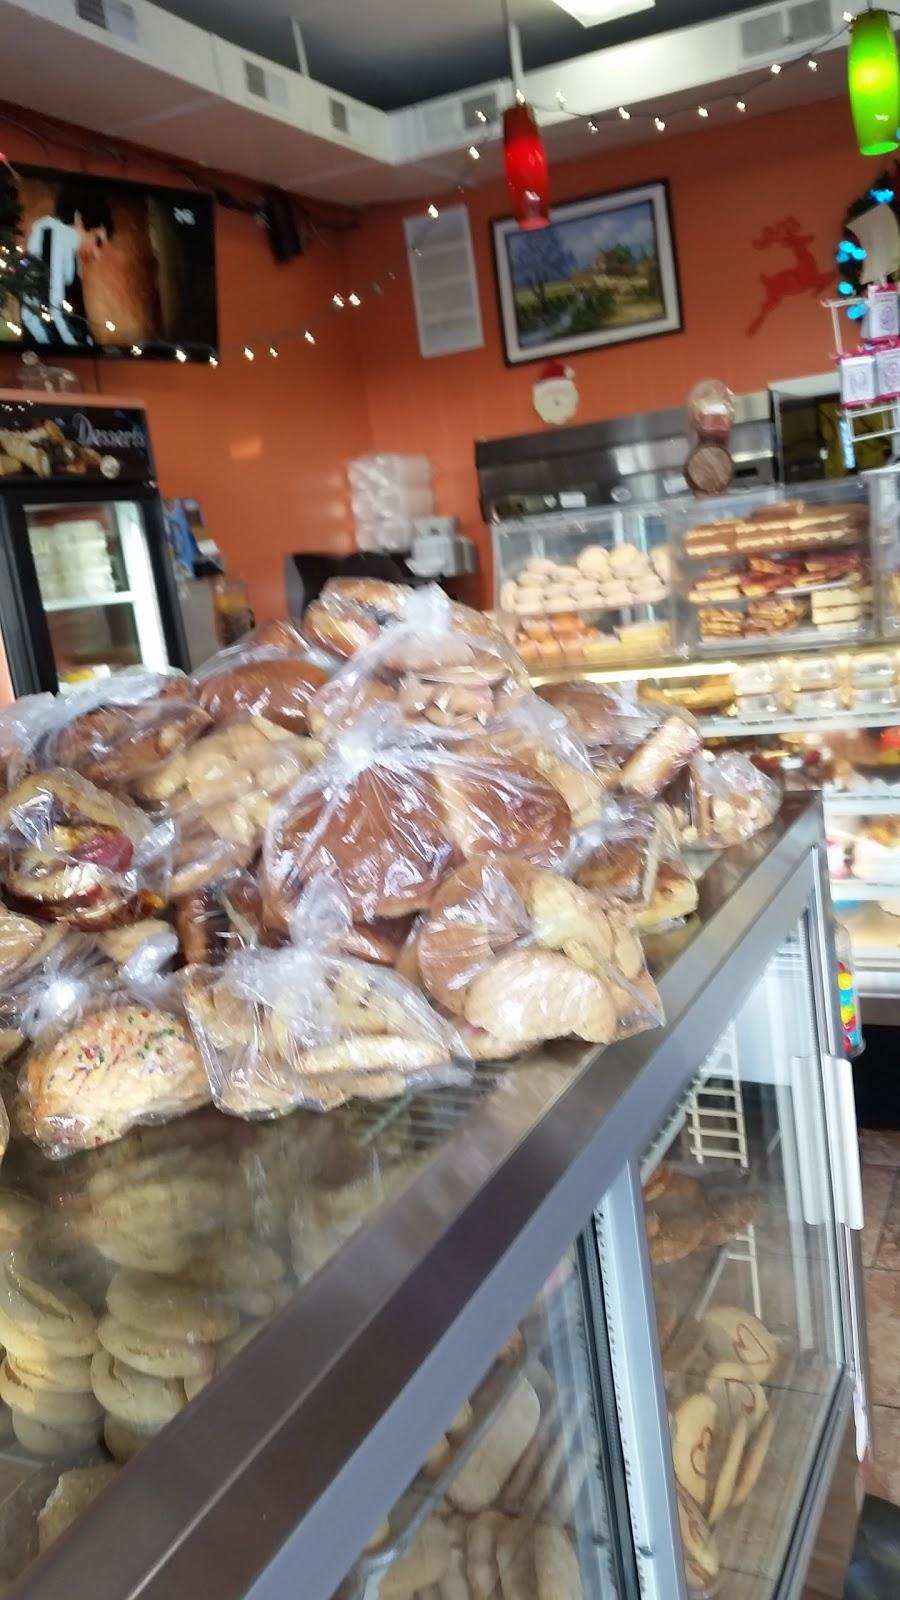 Caramelo Bakery - bakery  | Photo 7 of 10 | Address: 11301 Georgia Ave, Silver Spring, MD 20902, USA | Phone: (301) 942-9330